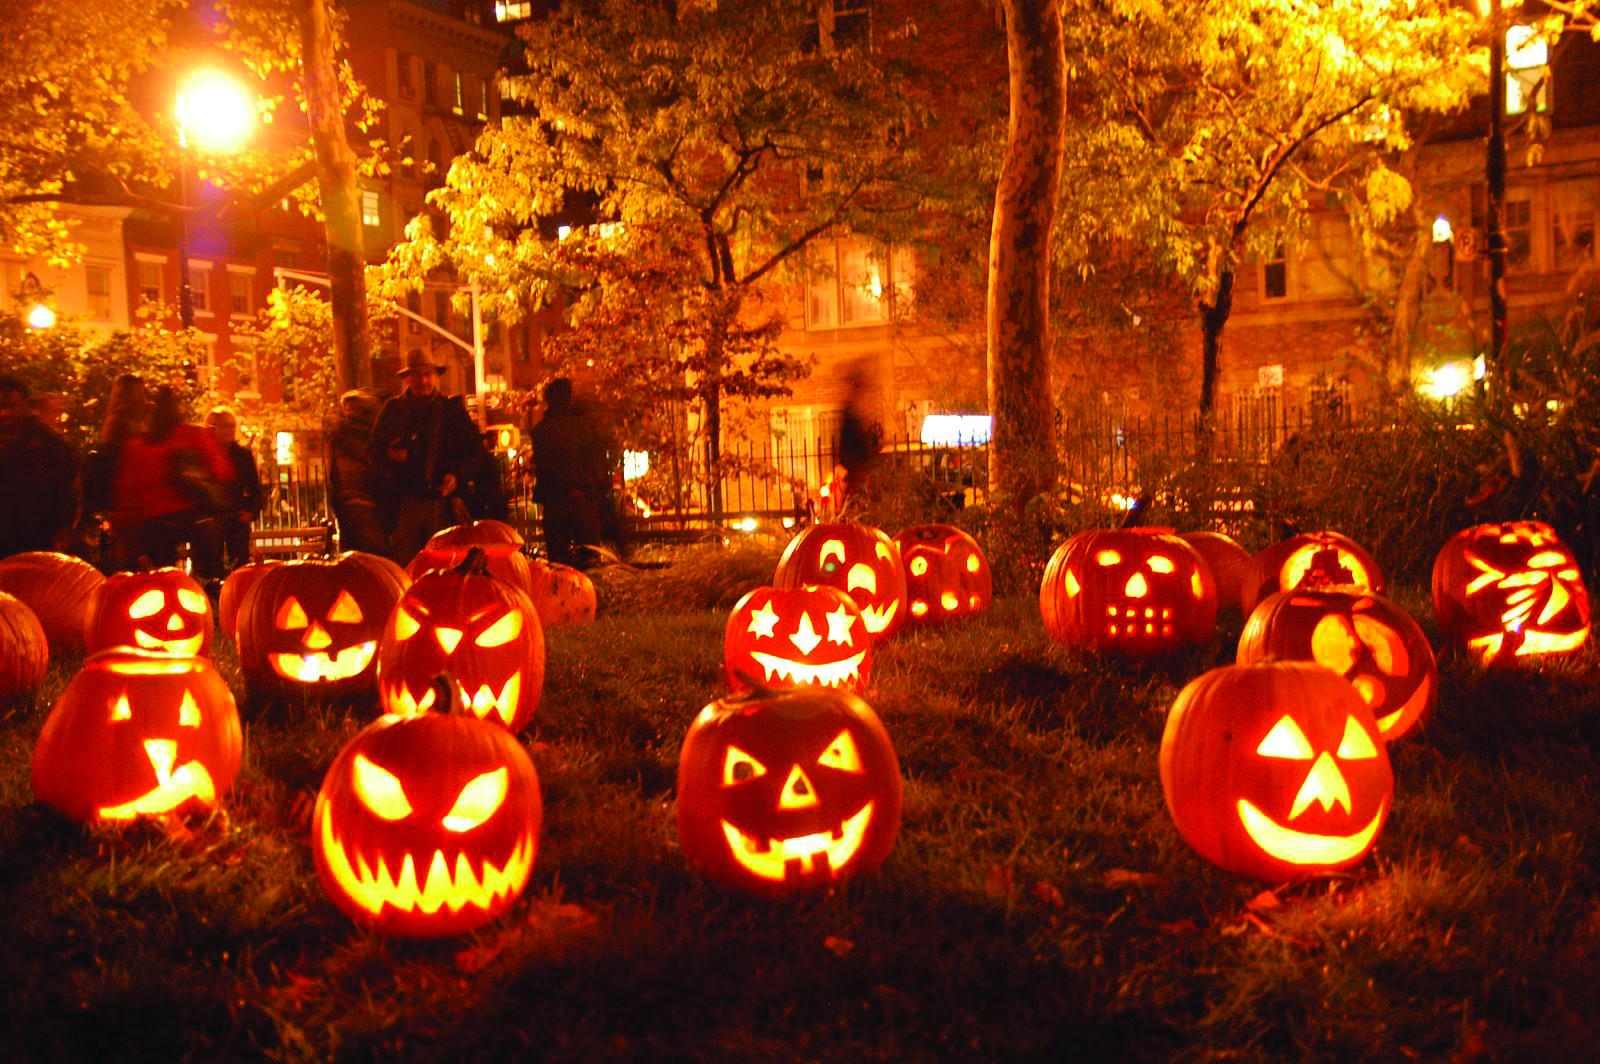 Halloween Backgrounds on Wallpapers Vista